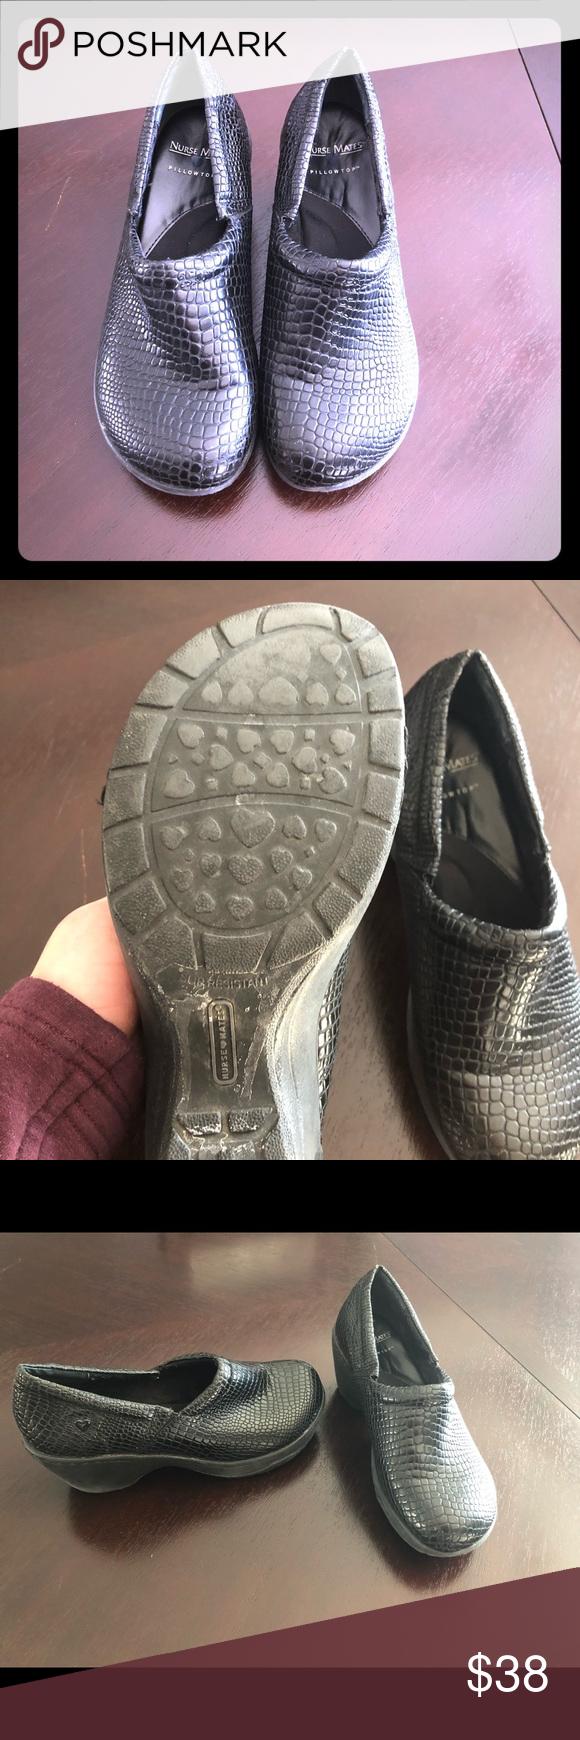 Nurse Mates pillow top shoes in 2020